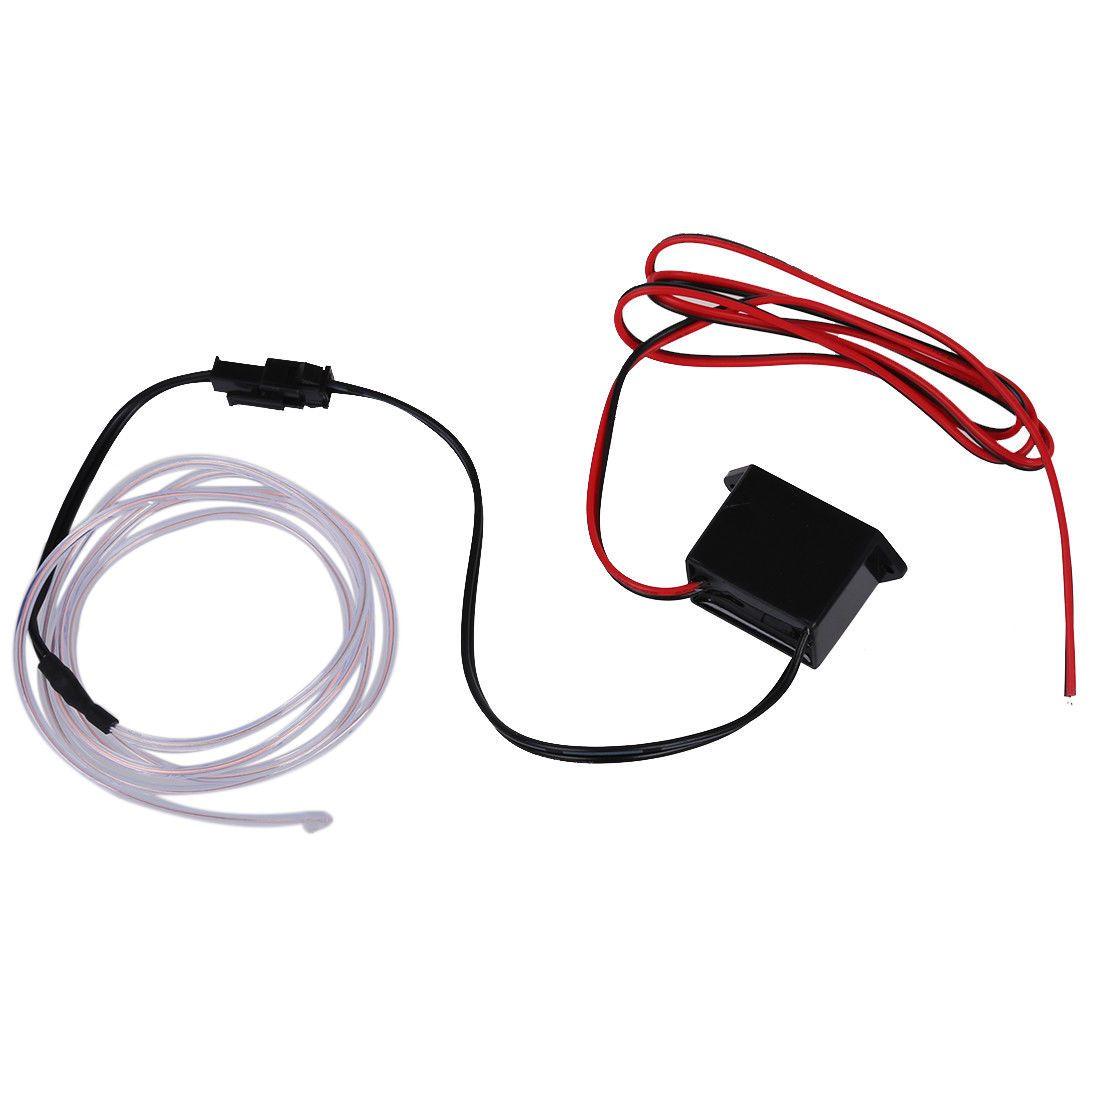 1.67 GBP - Led Flexible El Wire Neon Glow Tube Lamp Light 12V, 1M ...